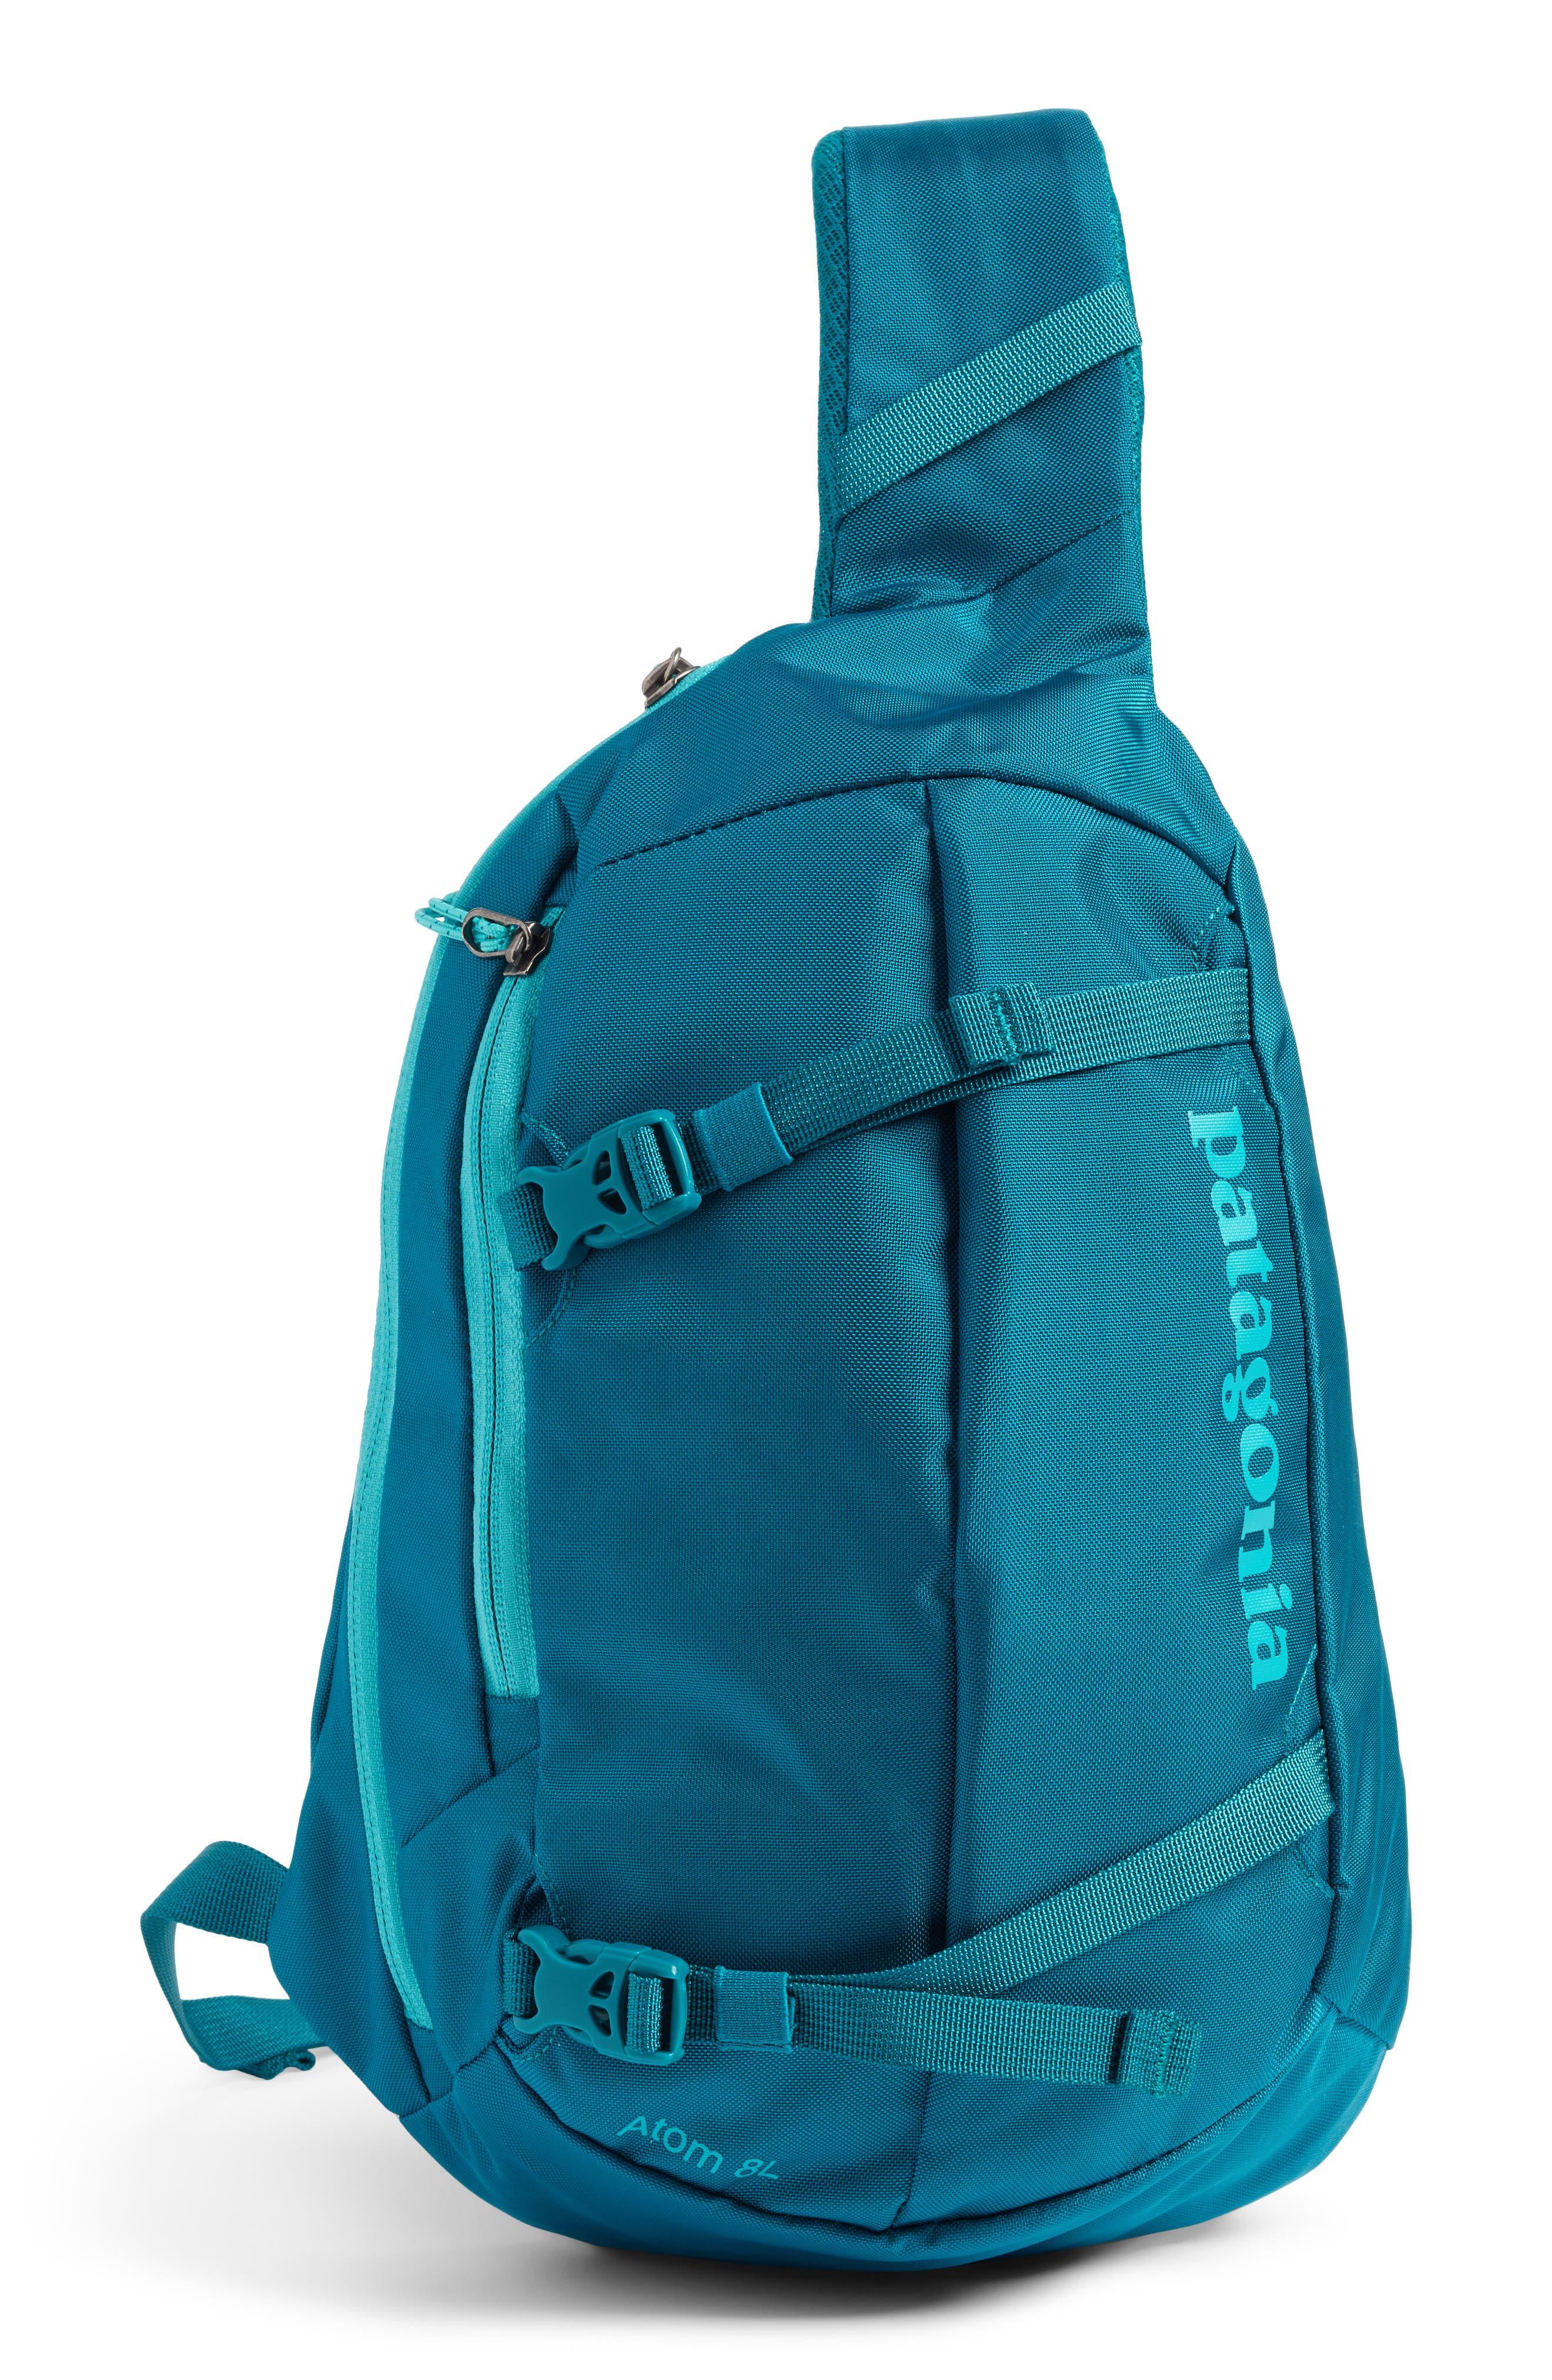 Atom 8L Sling Backpack,                             Main thumbnail 1, color,                             Elwha Blue